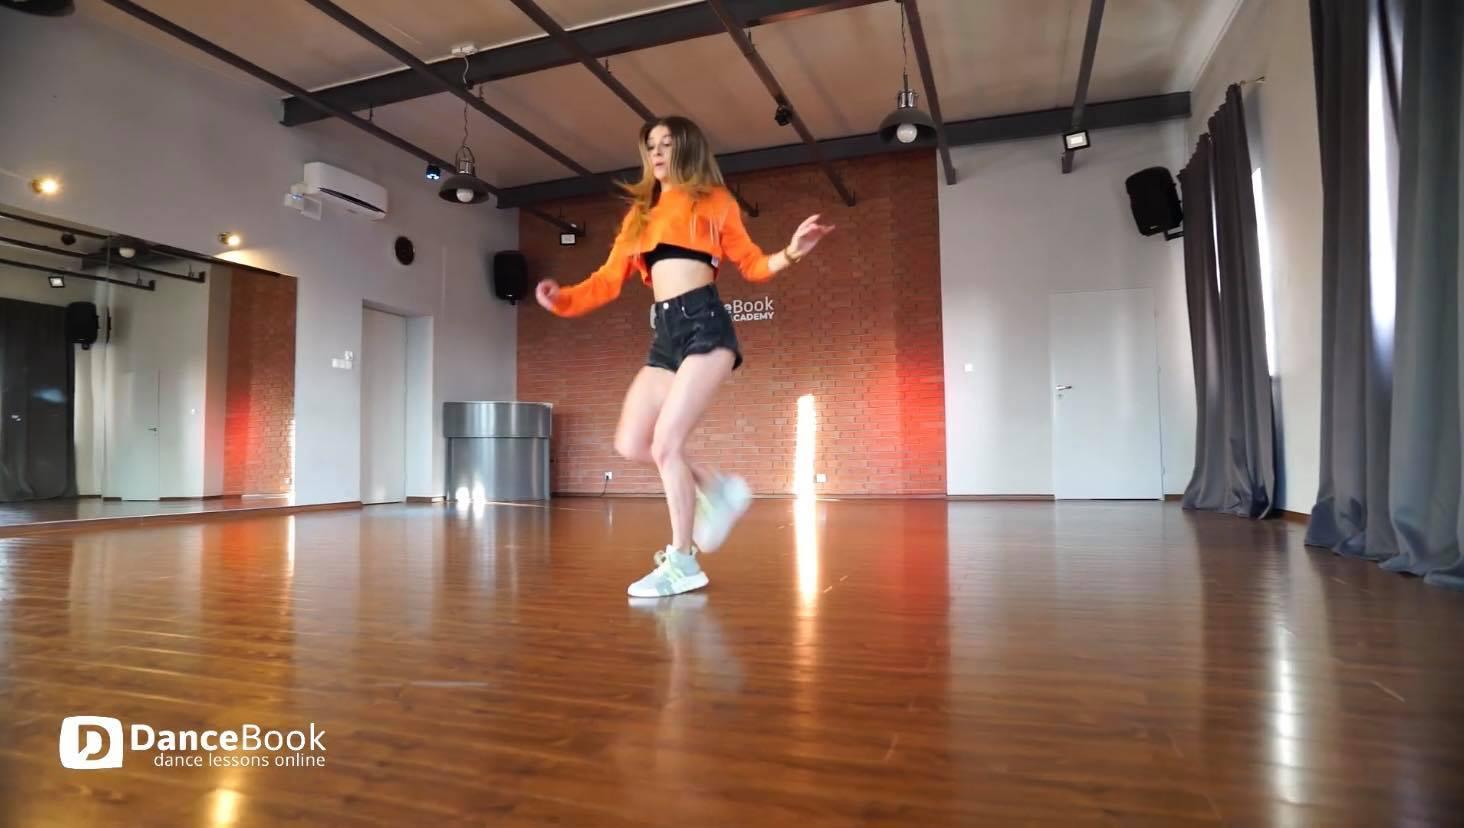 Shuffle Dance Choreography - Tik Tok Shuffle Dances - Nauka Krok po Kroku